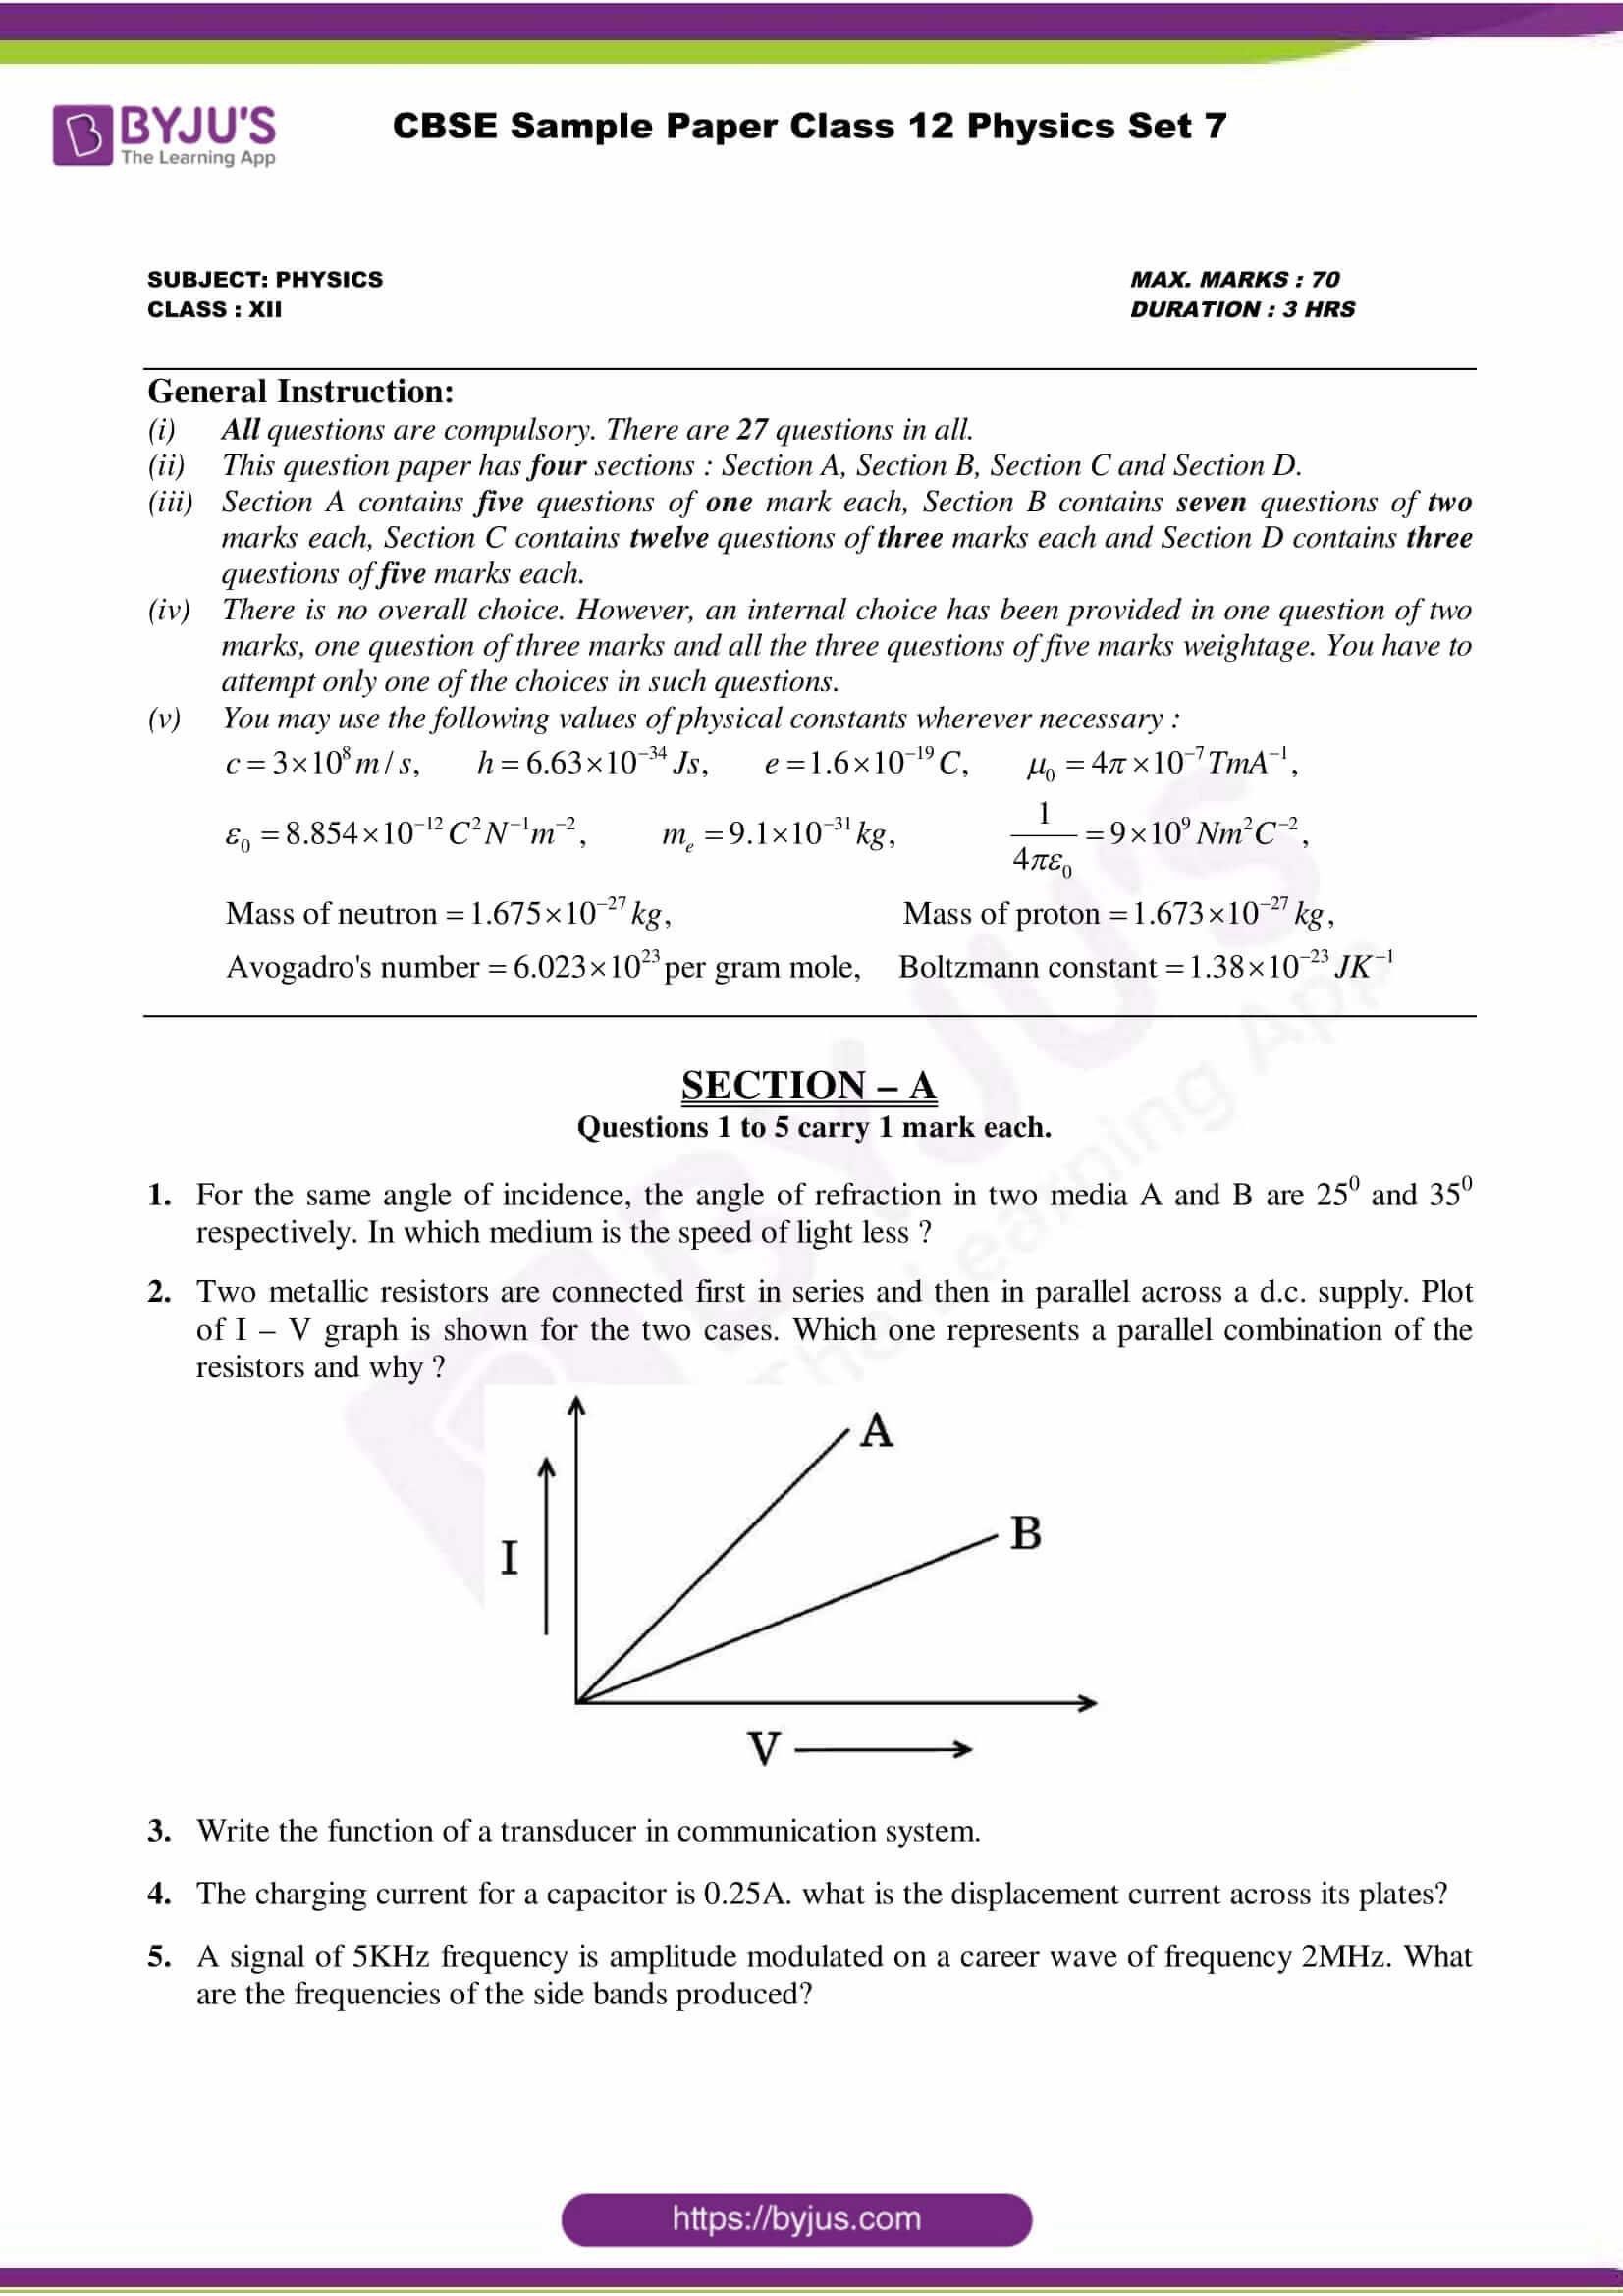 cbse class 12 physics sample paper set 7